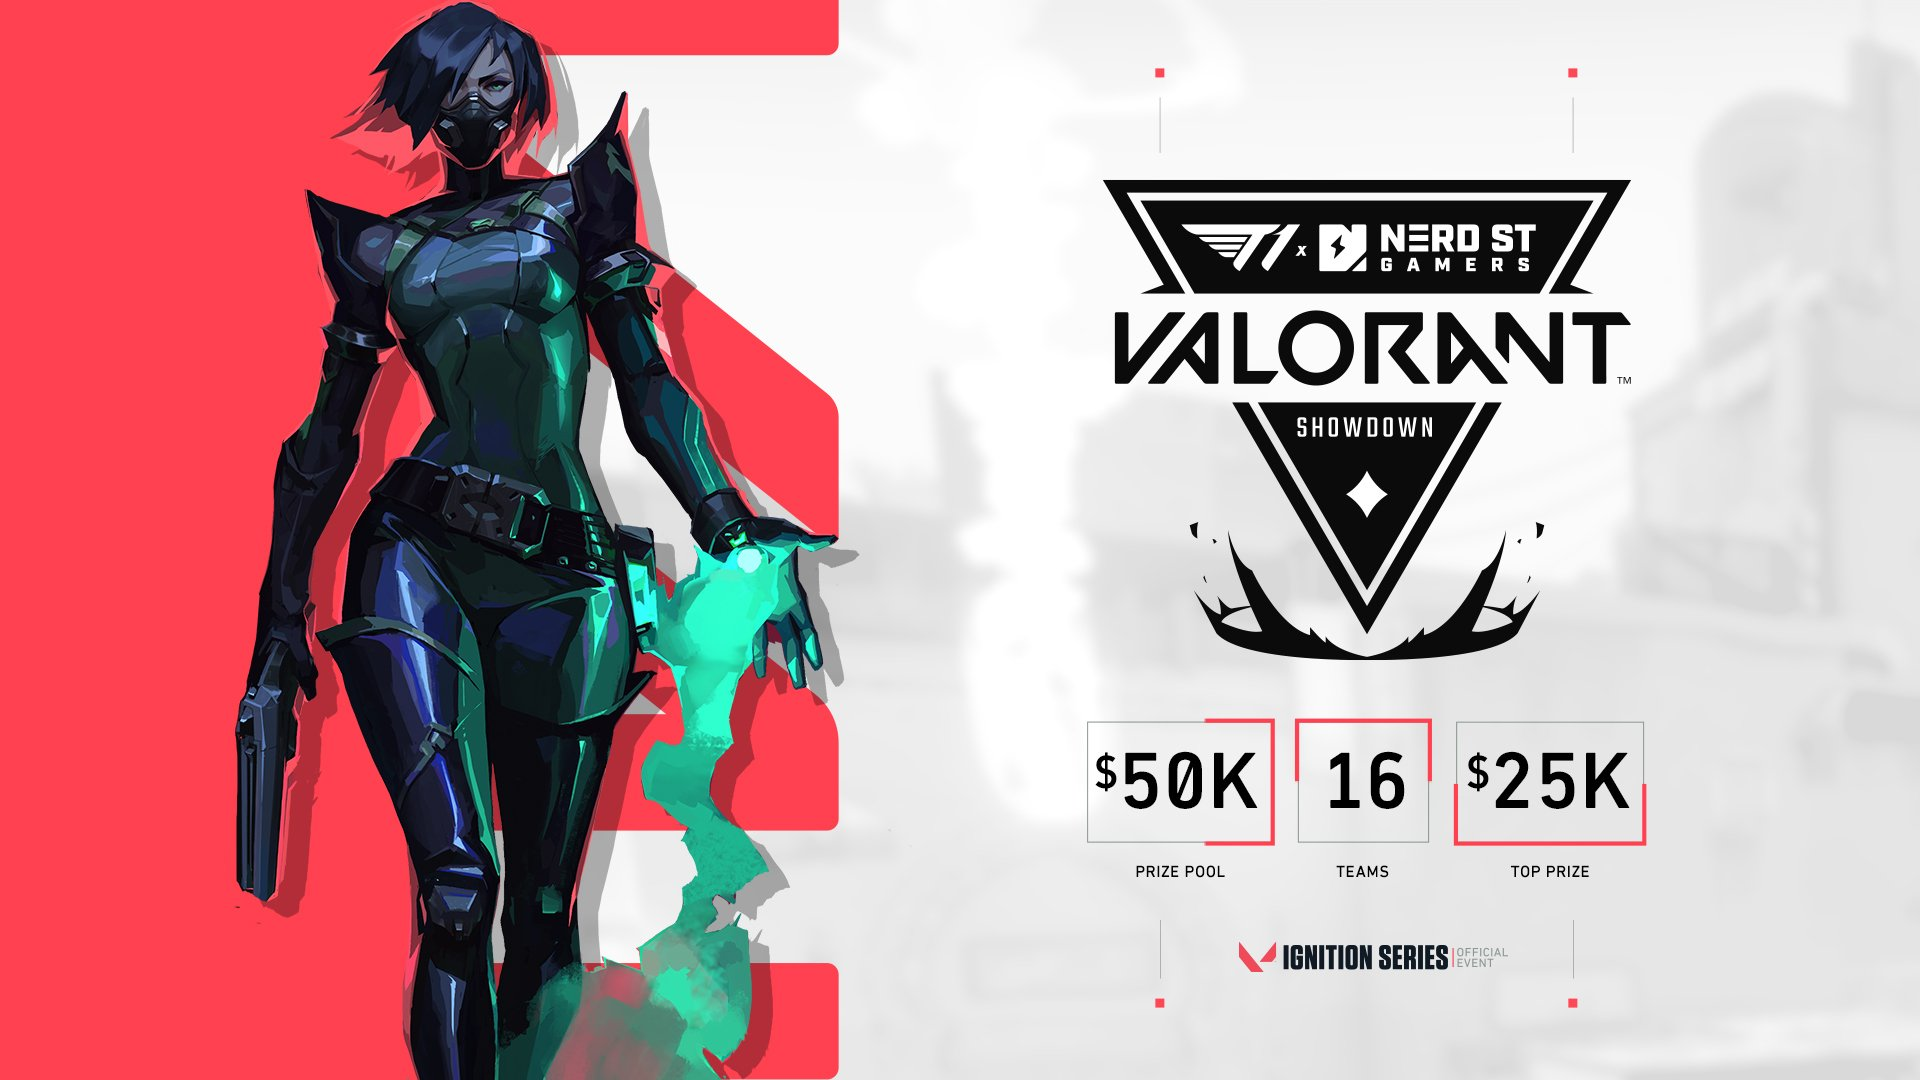 T1 x Nerd Street Gamers VALORANT Showdown announced